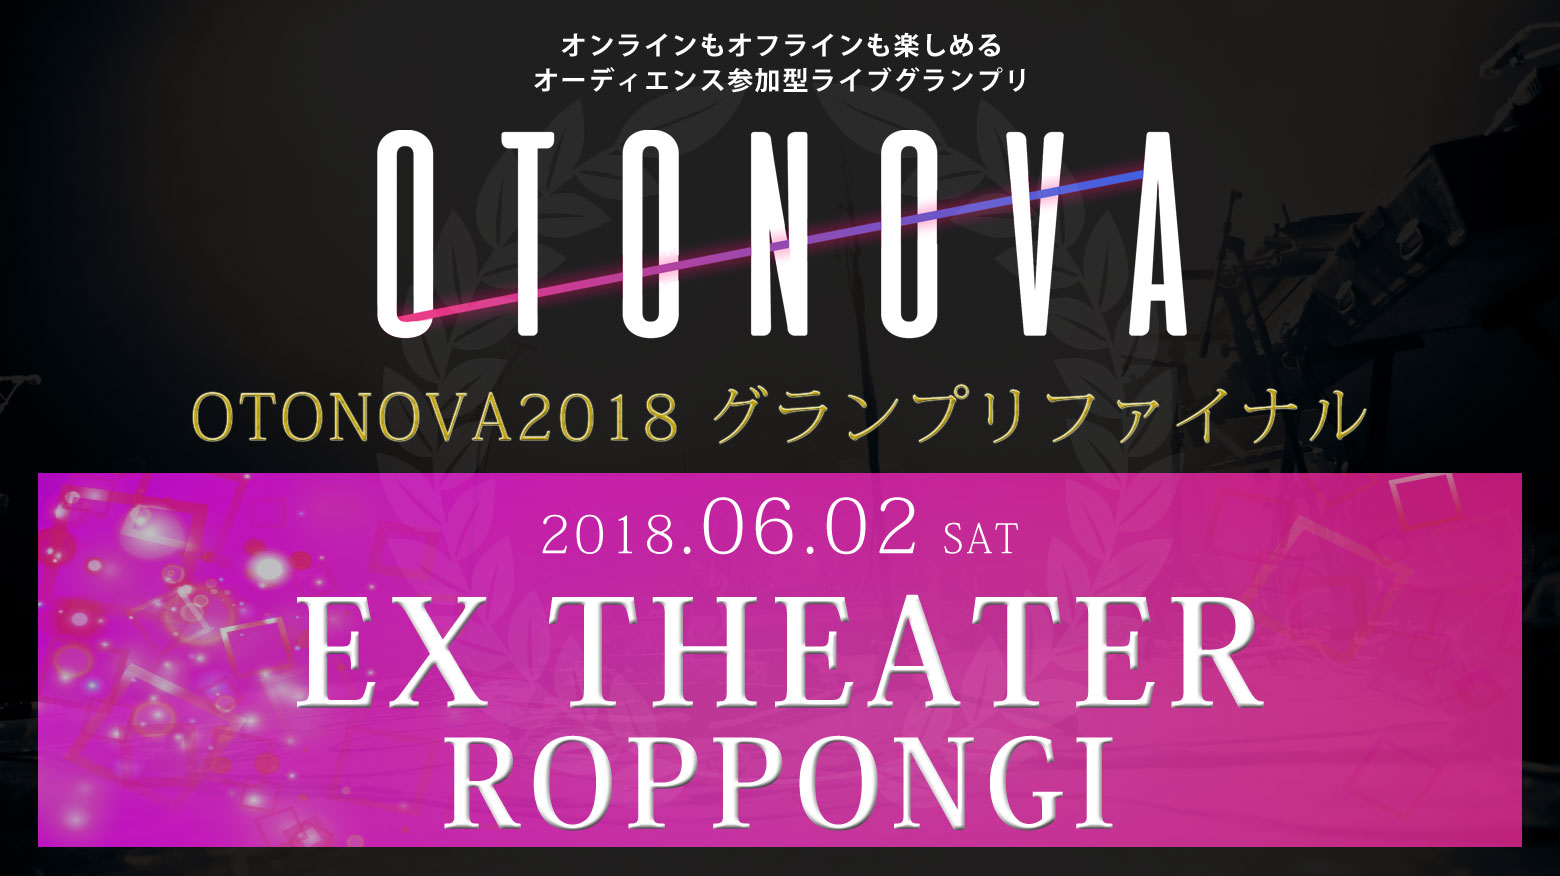 OTONOVA2018「グランプリファイナル」